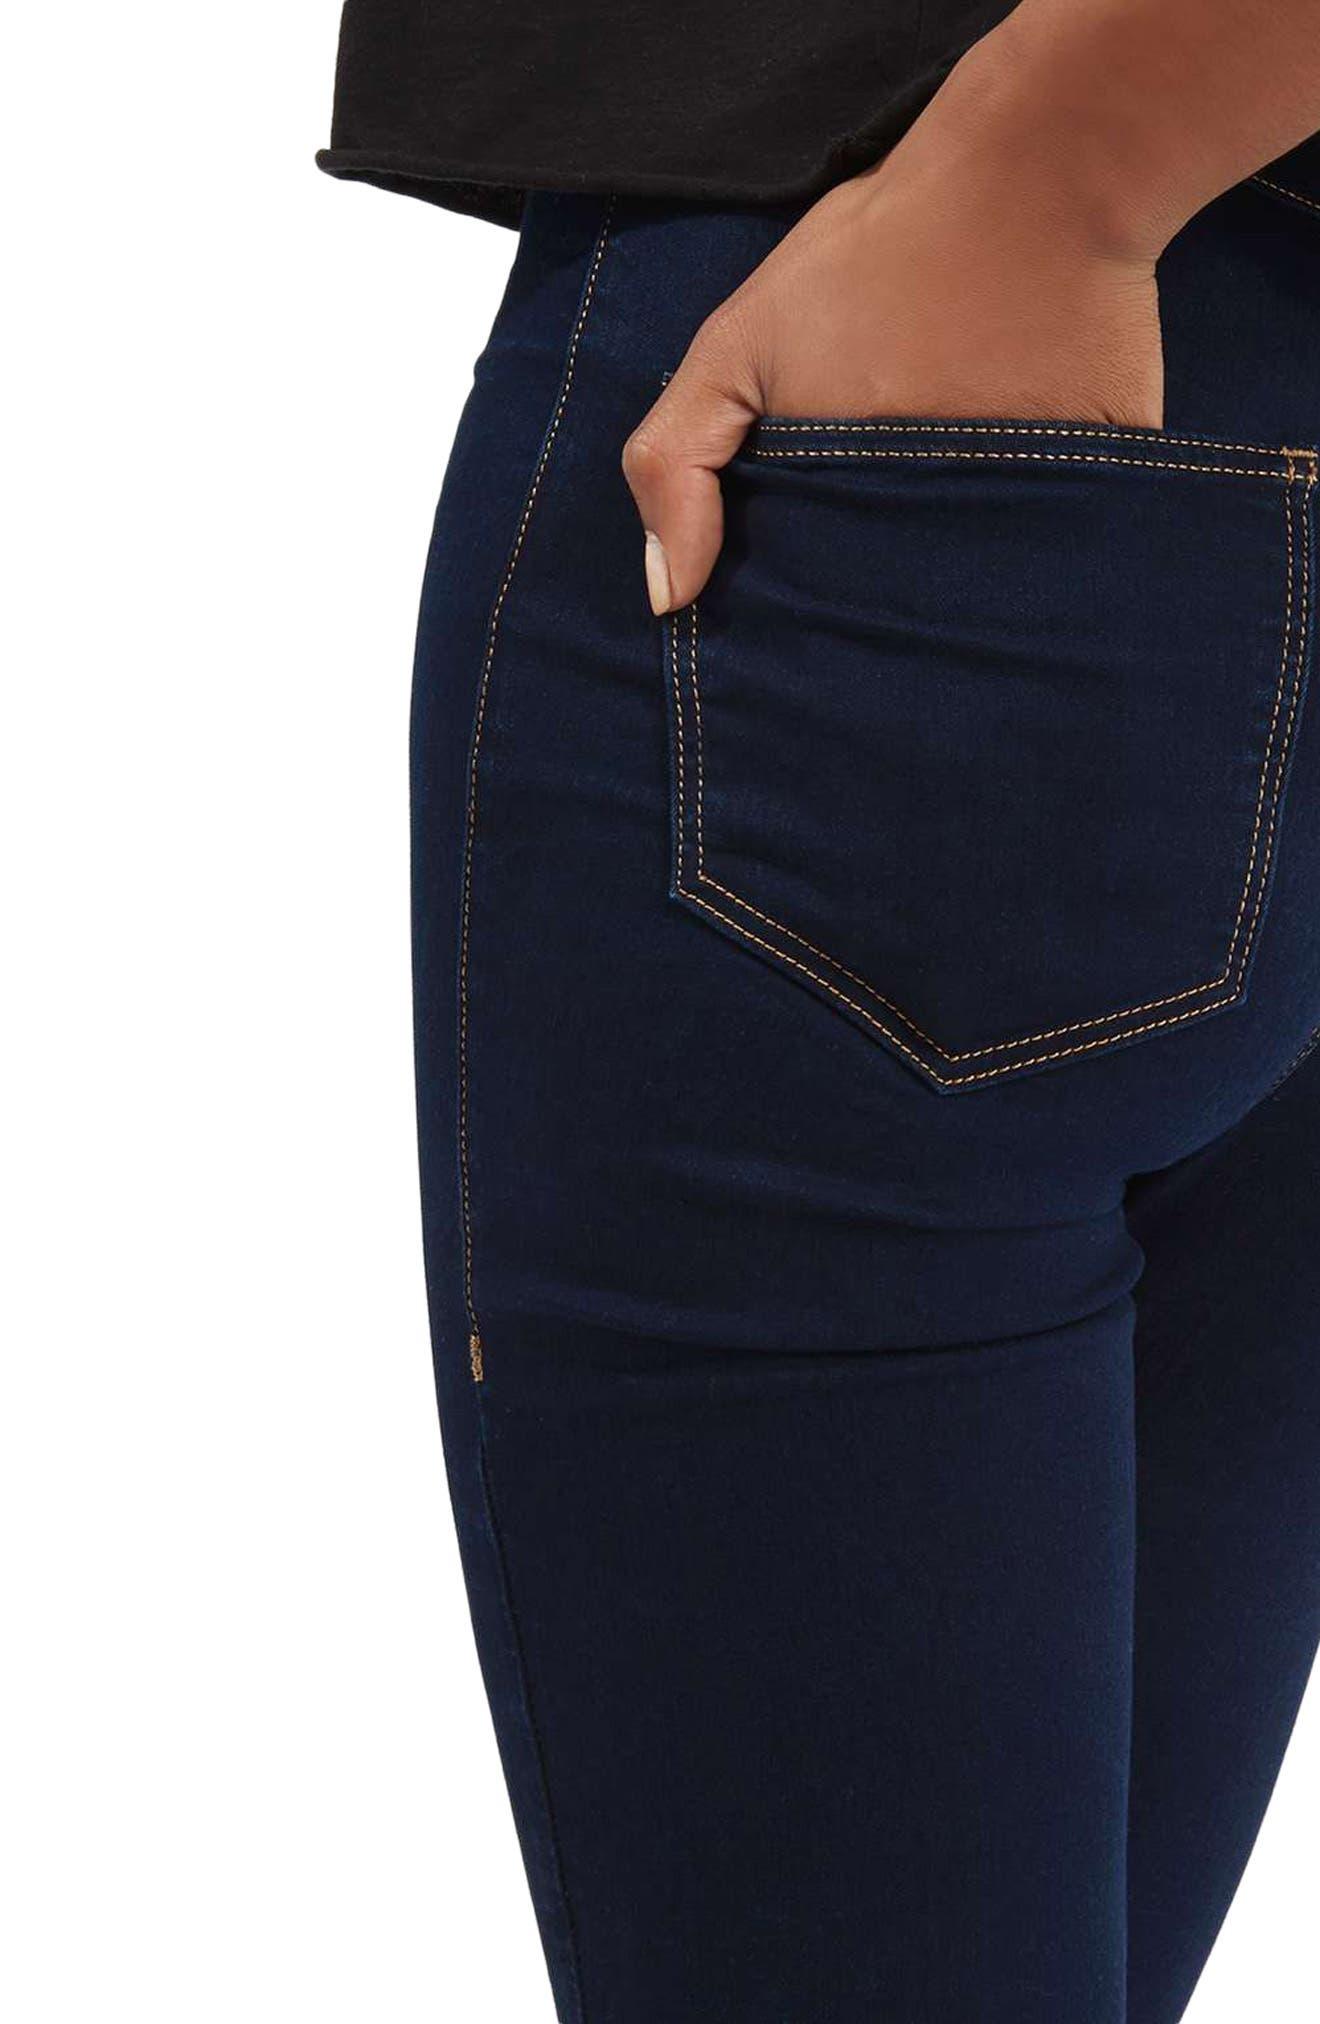 TOPSHOP,                             Joni High Waist Skinny Jeans,                             Alternate thumbnail 3, color,                             400